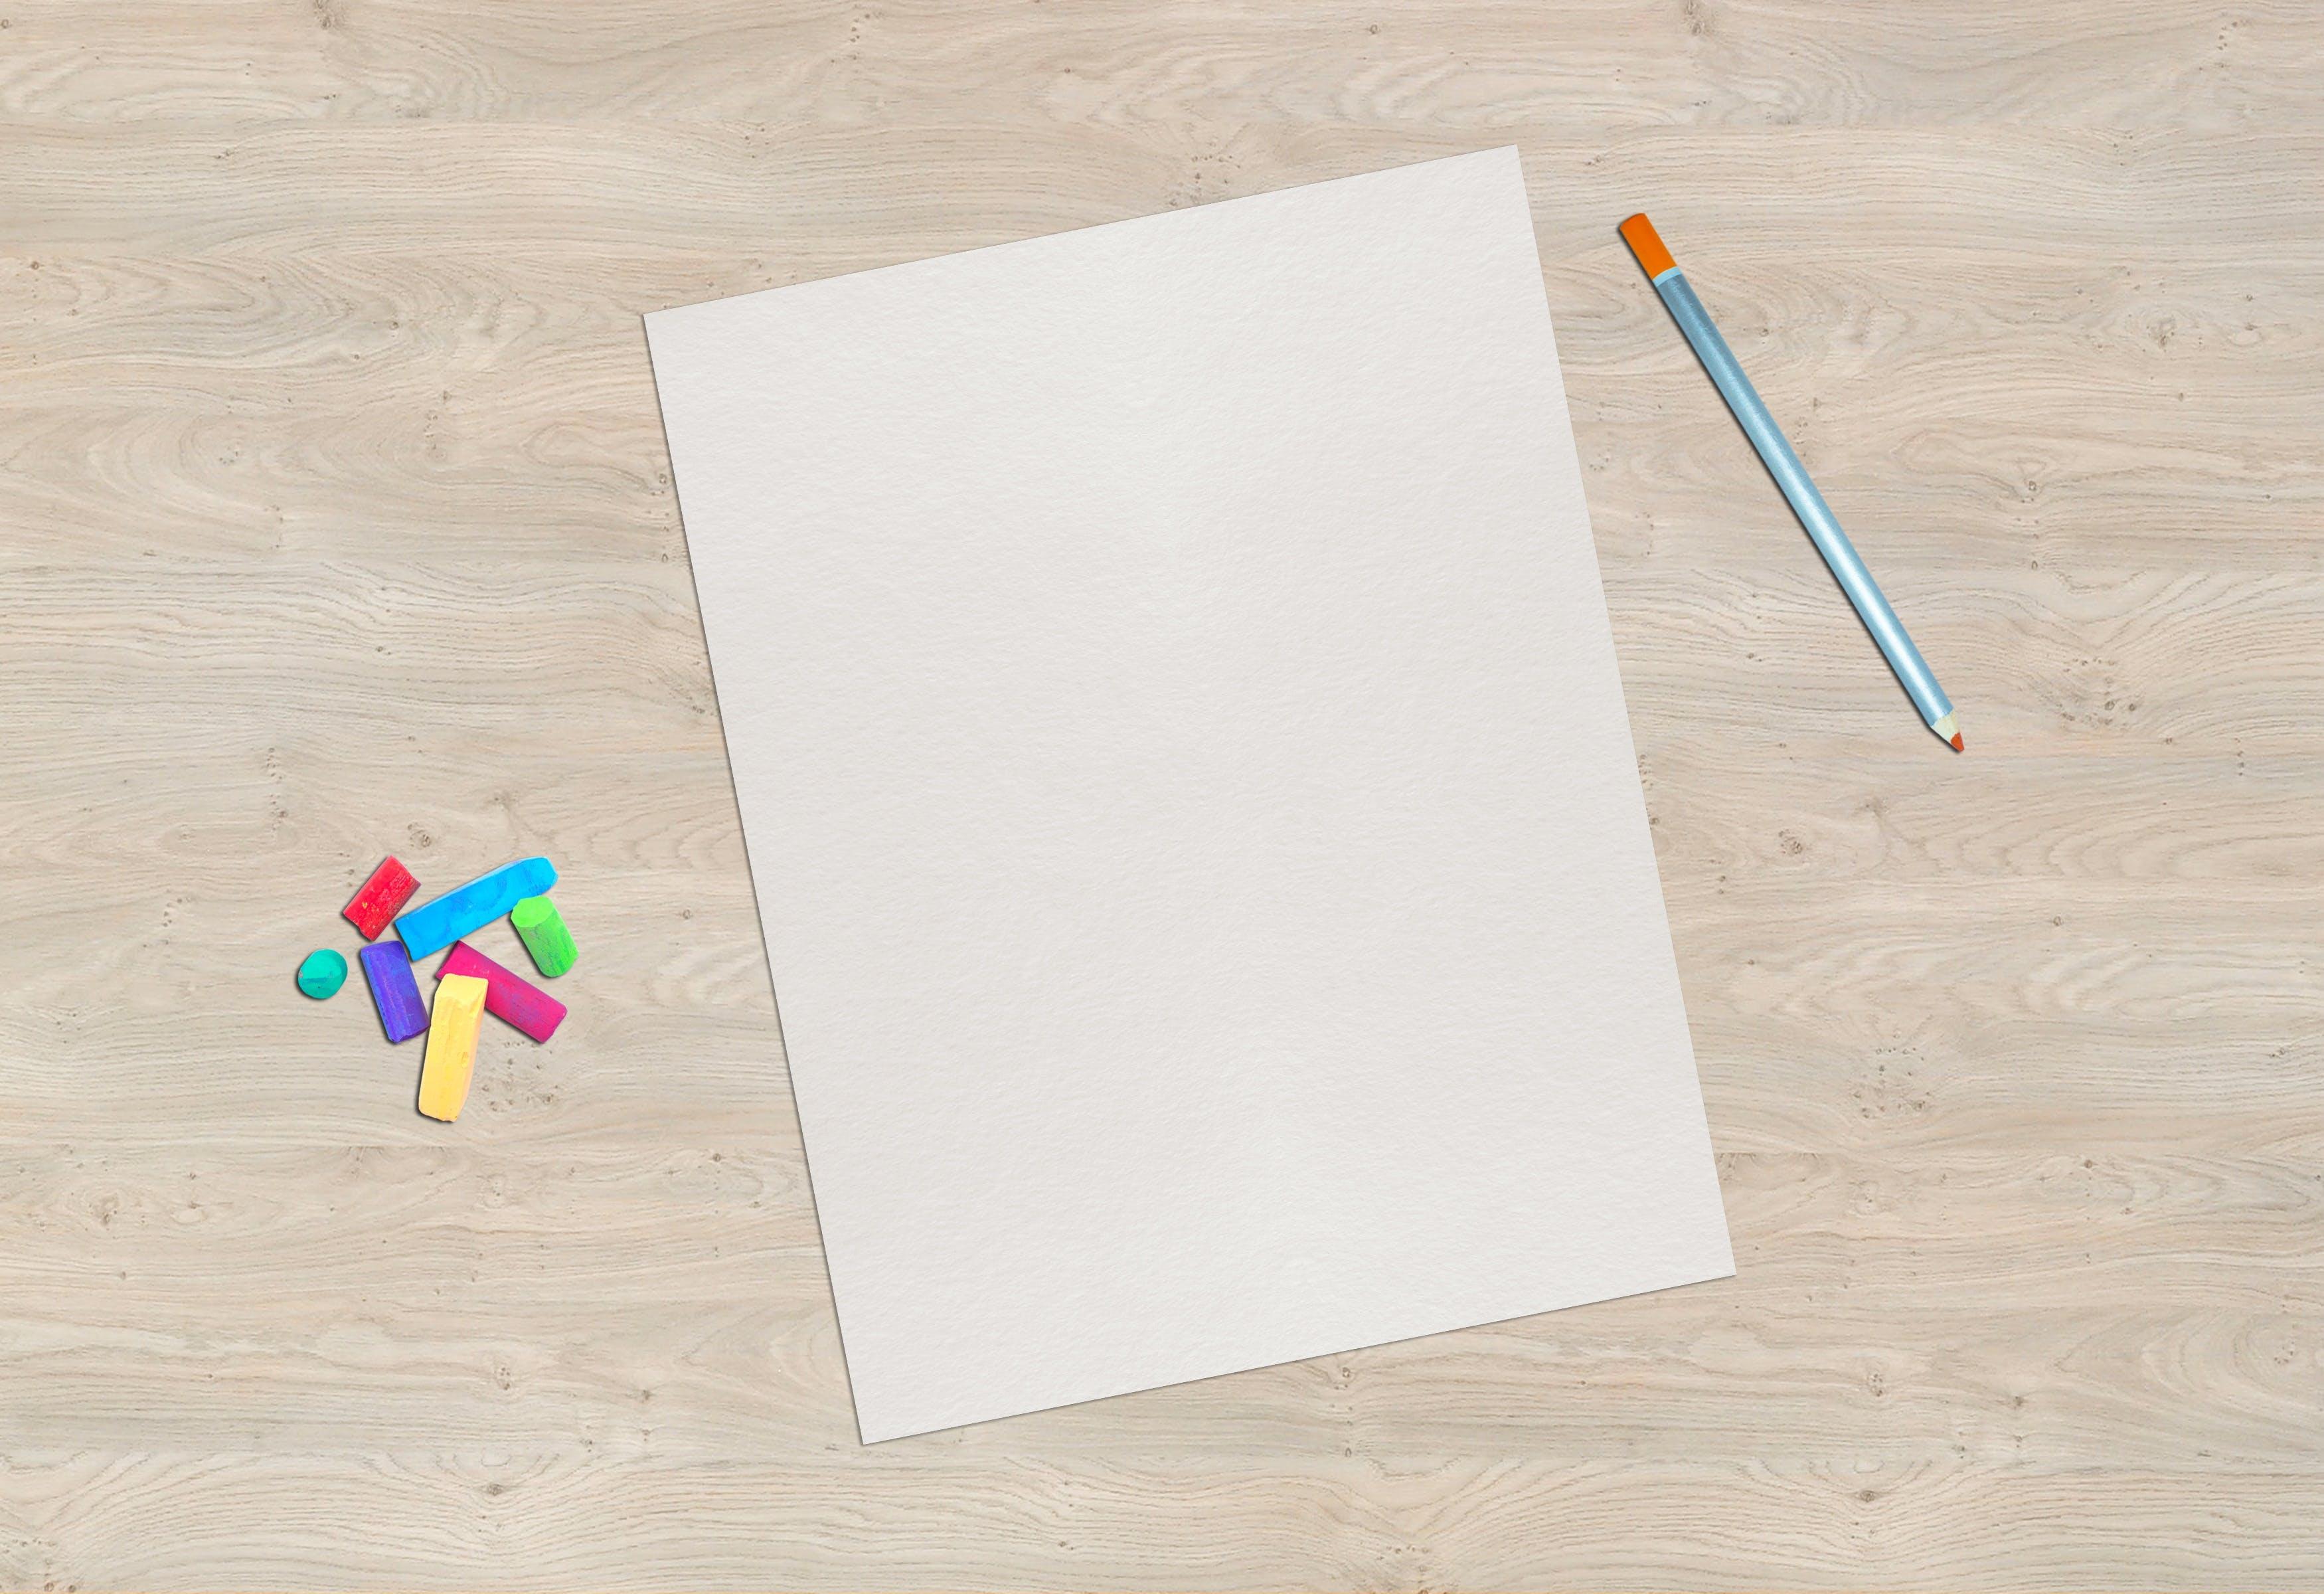 Gray Pen Near White Pad Paper